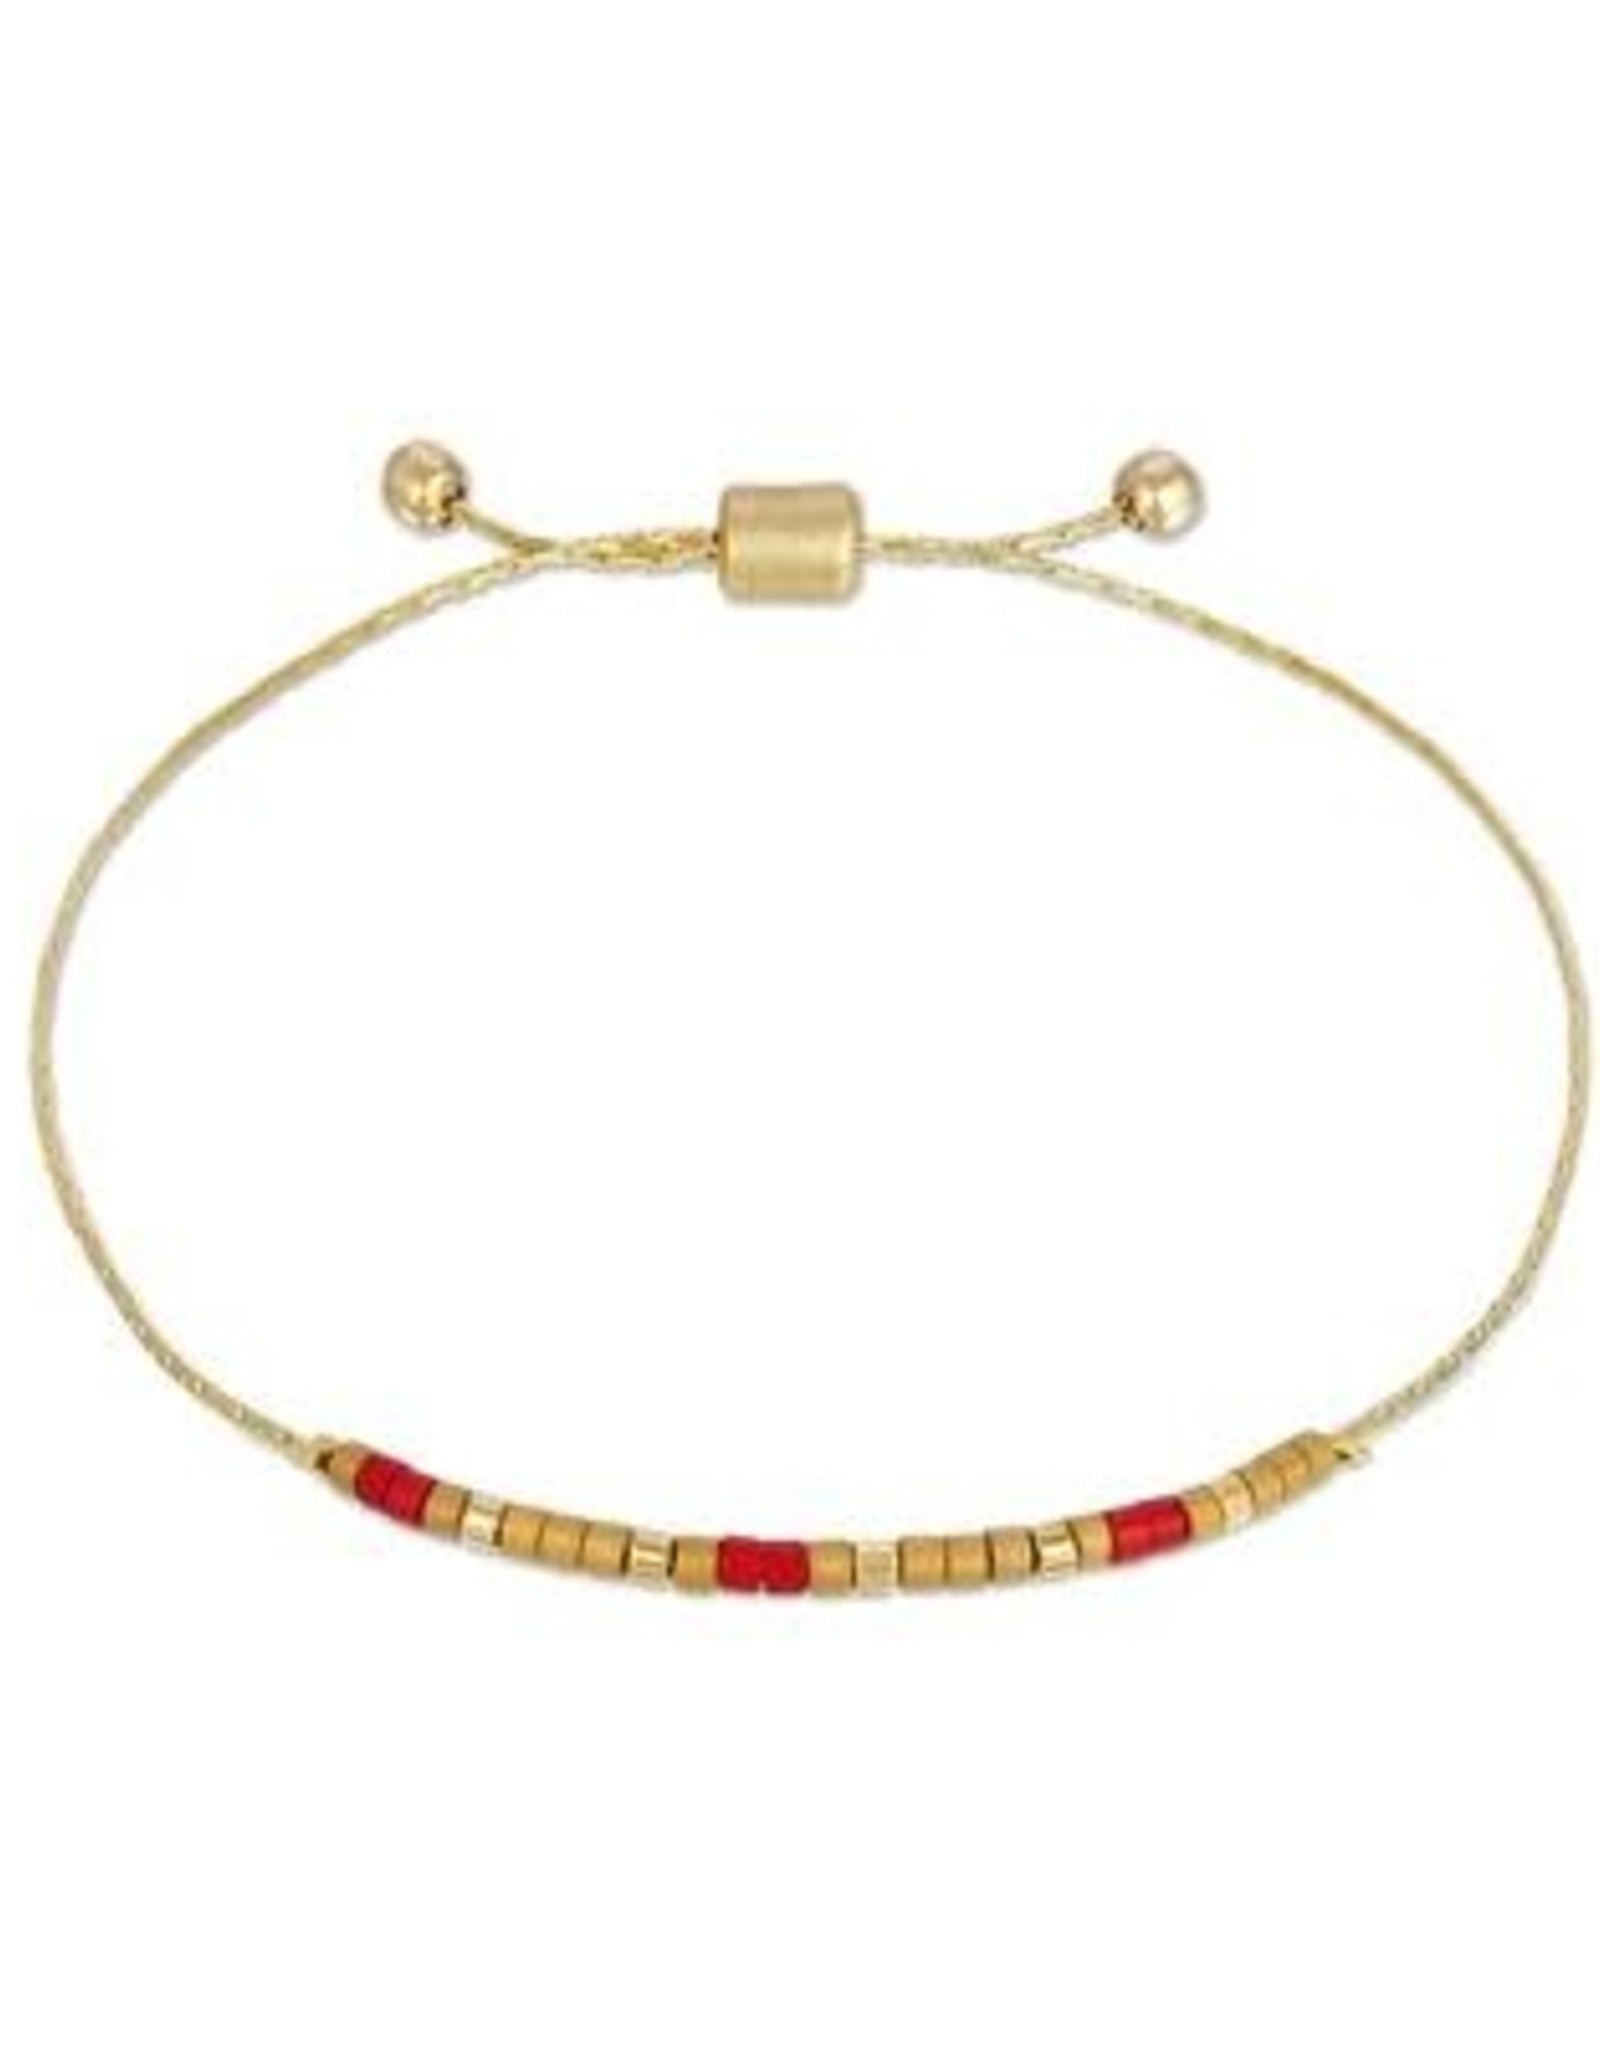 Morse Code Bracelet XOXO